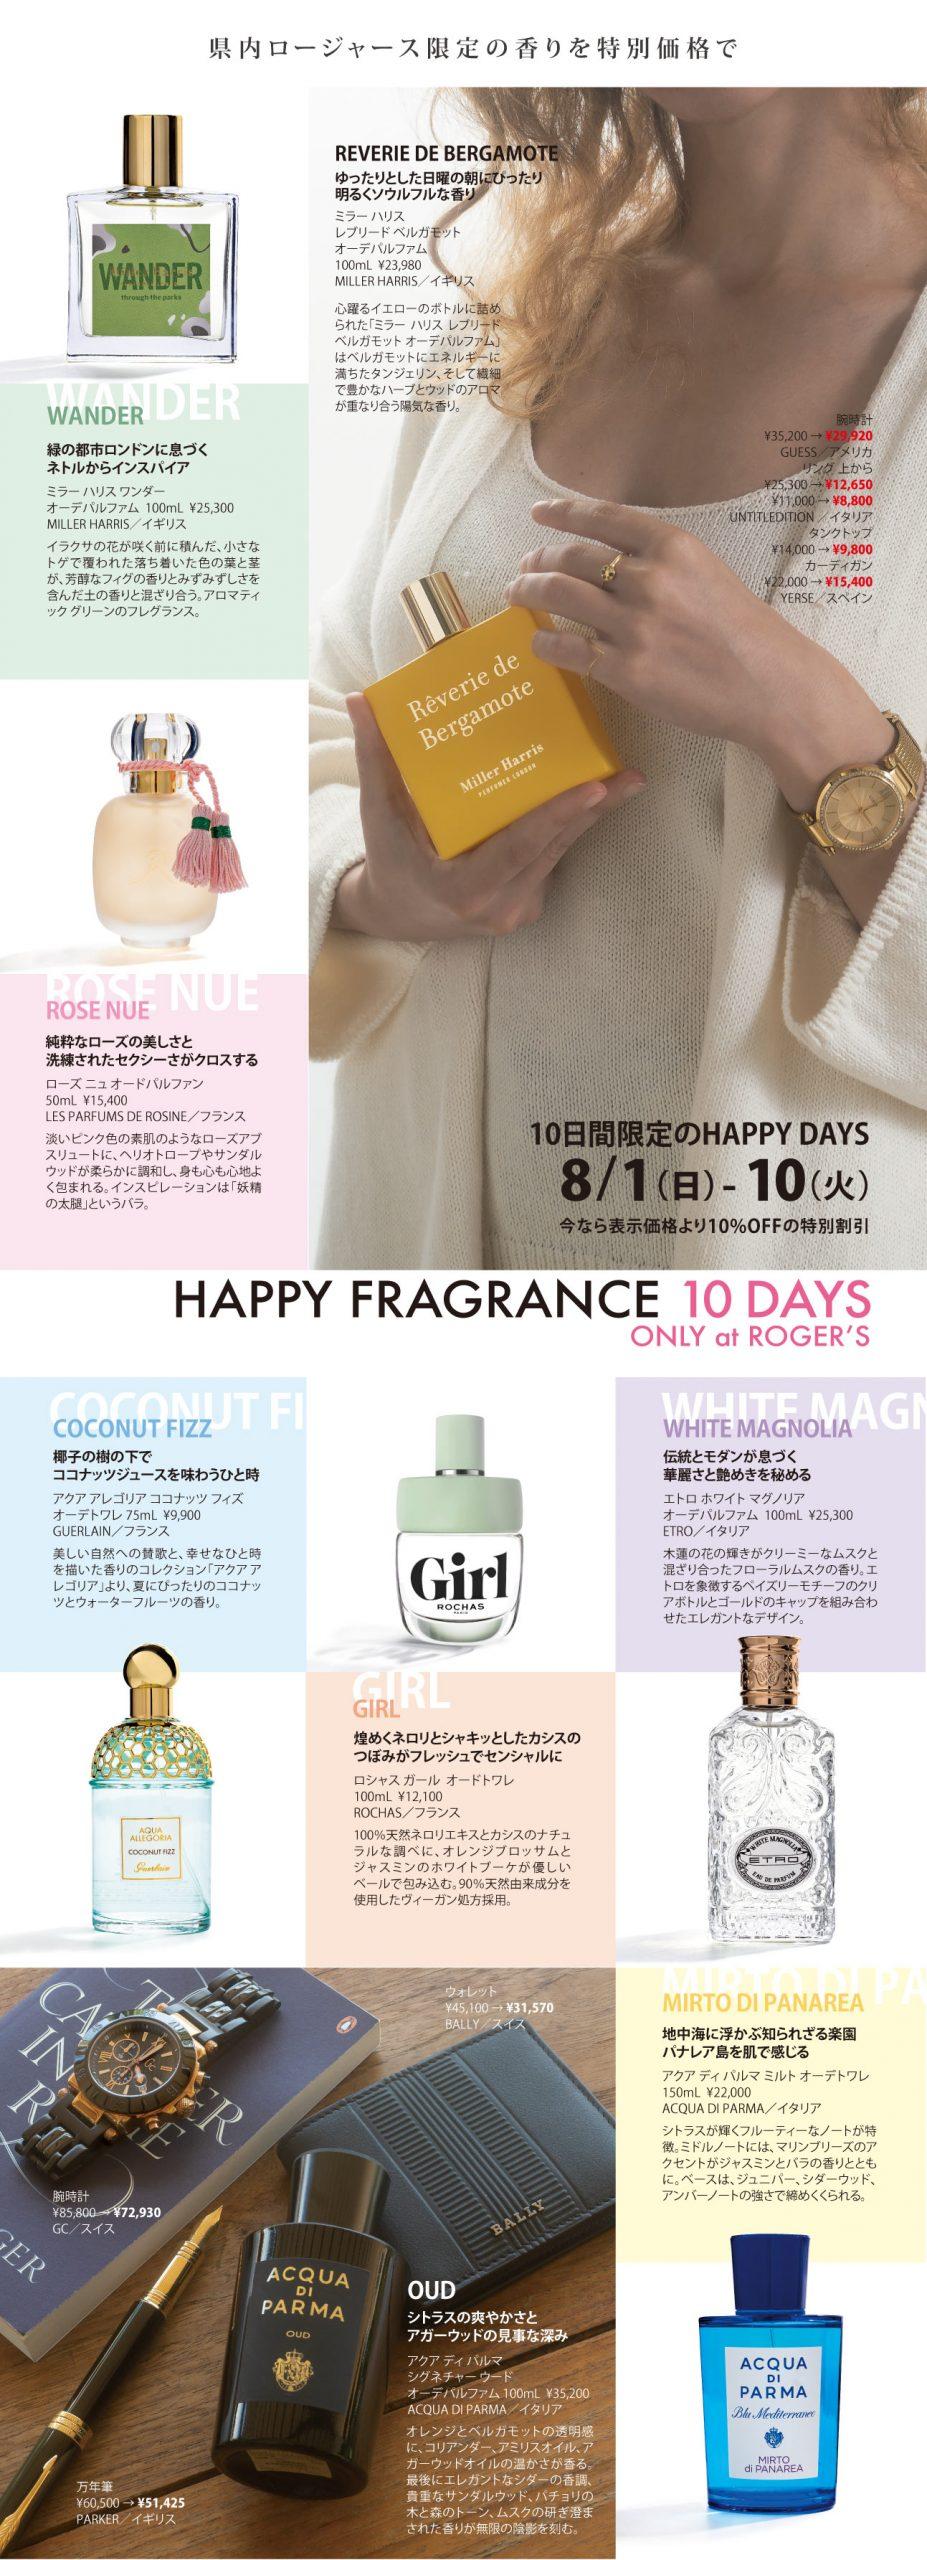 HAPPY FRAGRANCE 10 DAYS (8/1-8/10) 県内ロージャース限定の香りを特別価格で